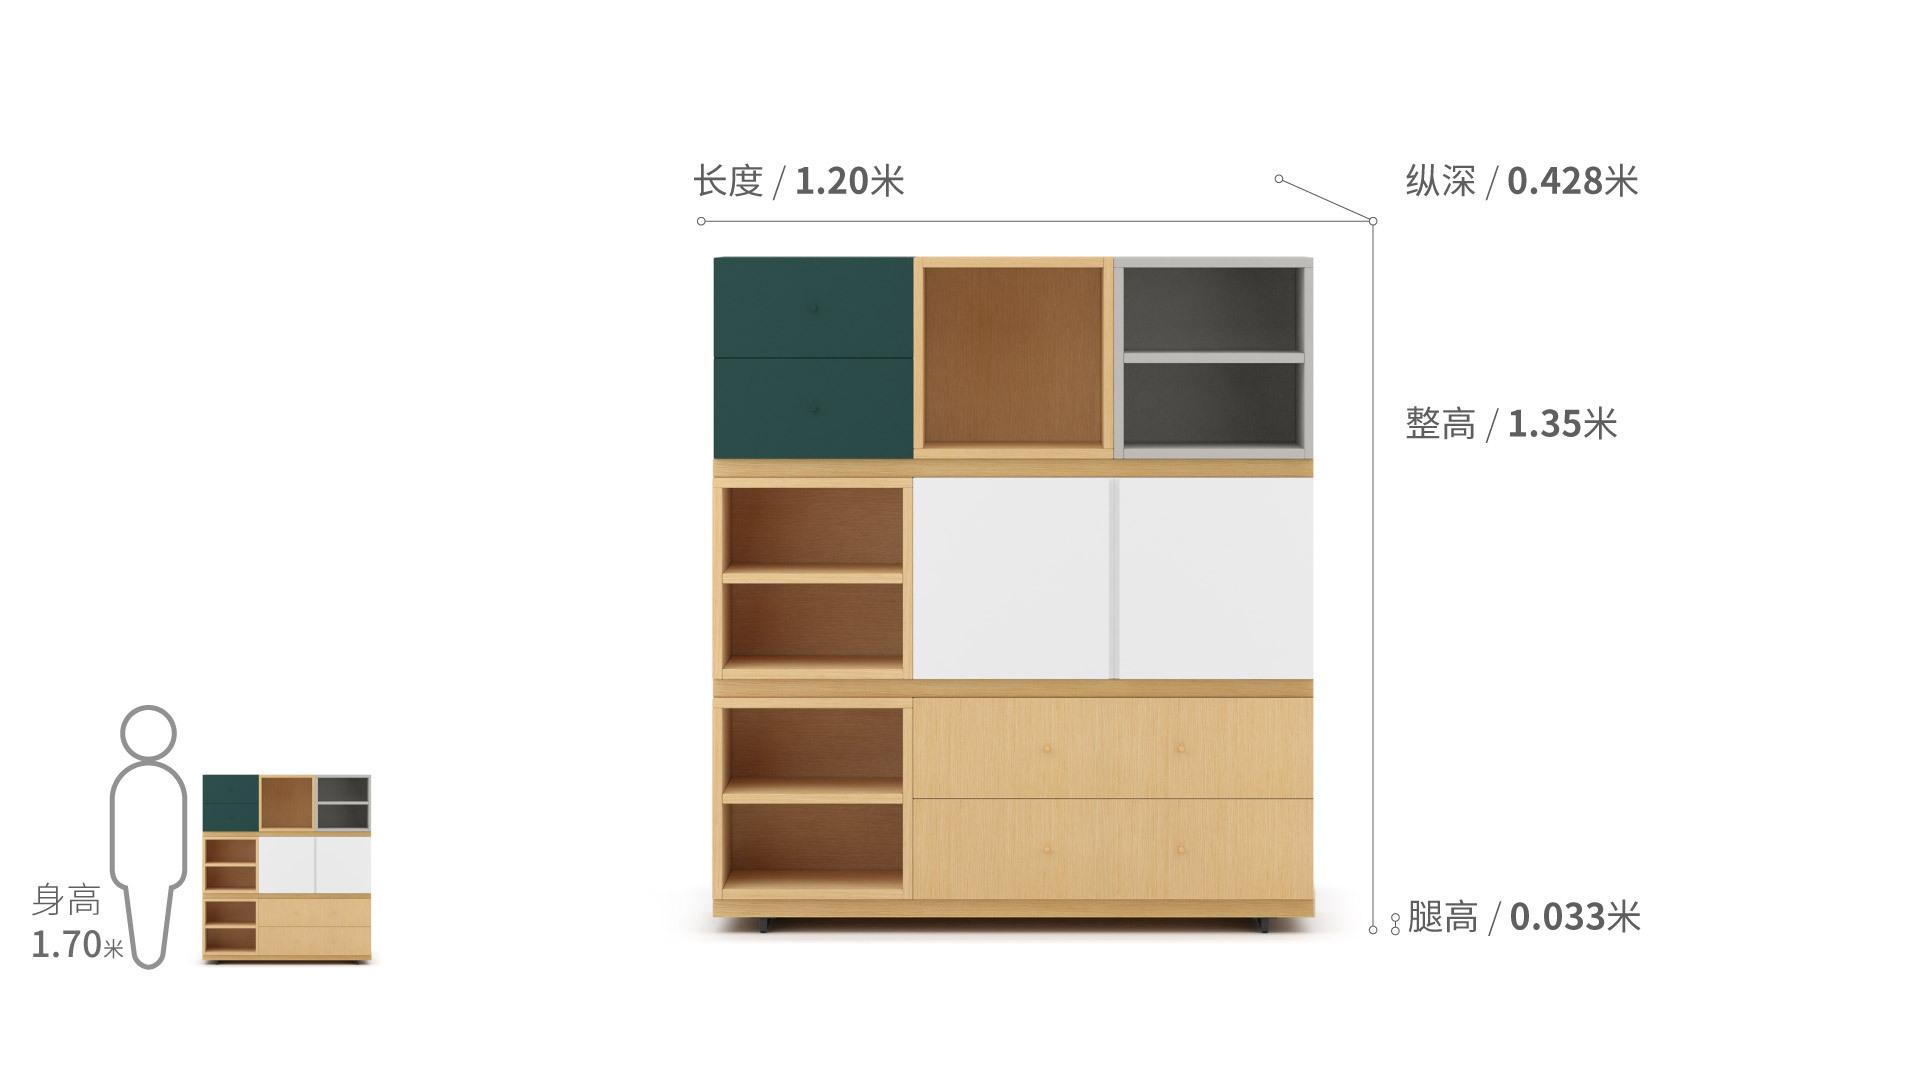 COSMO星格™置物柜1.35米高置物柜柜架效果图